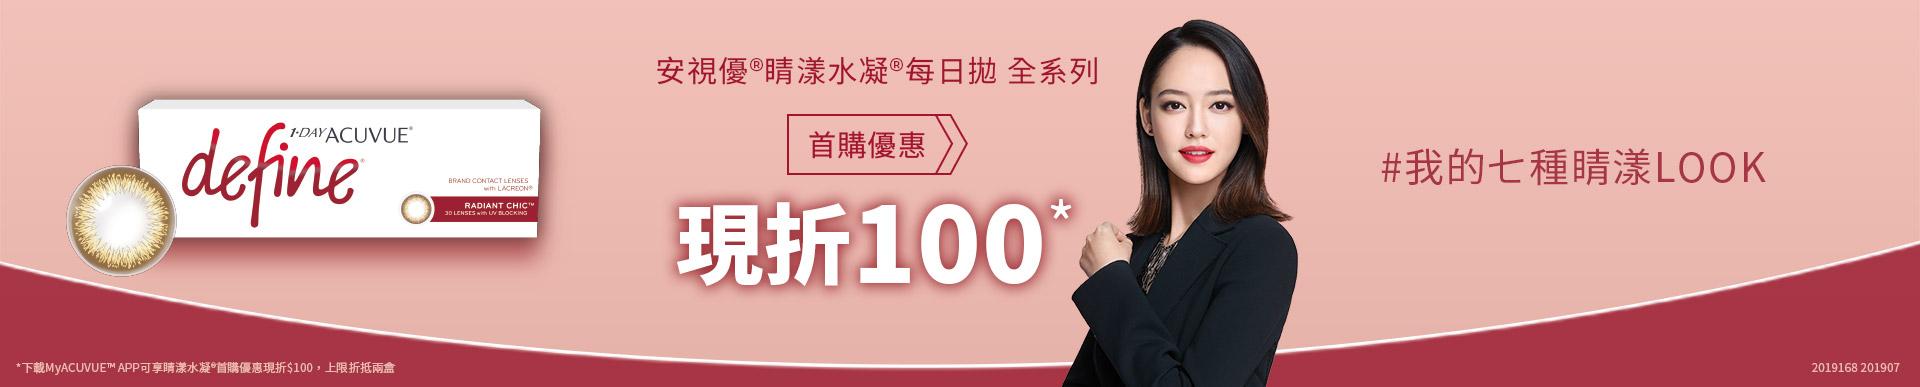 new-banner-homepage.jpg